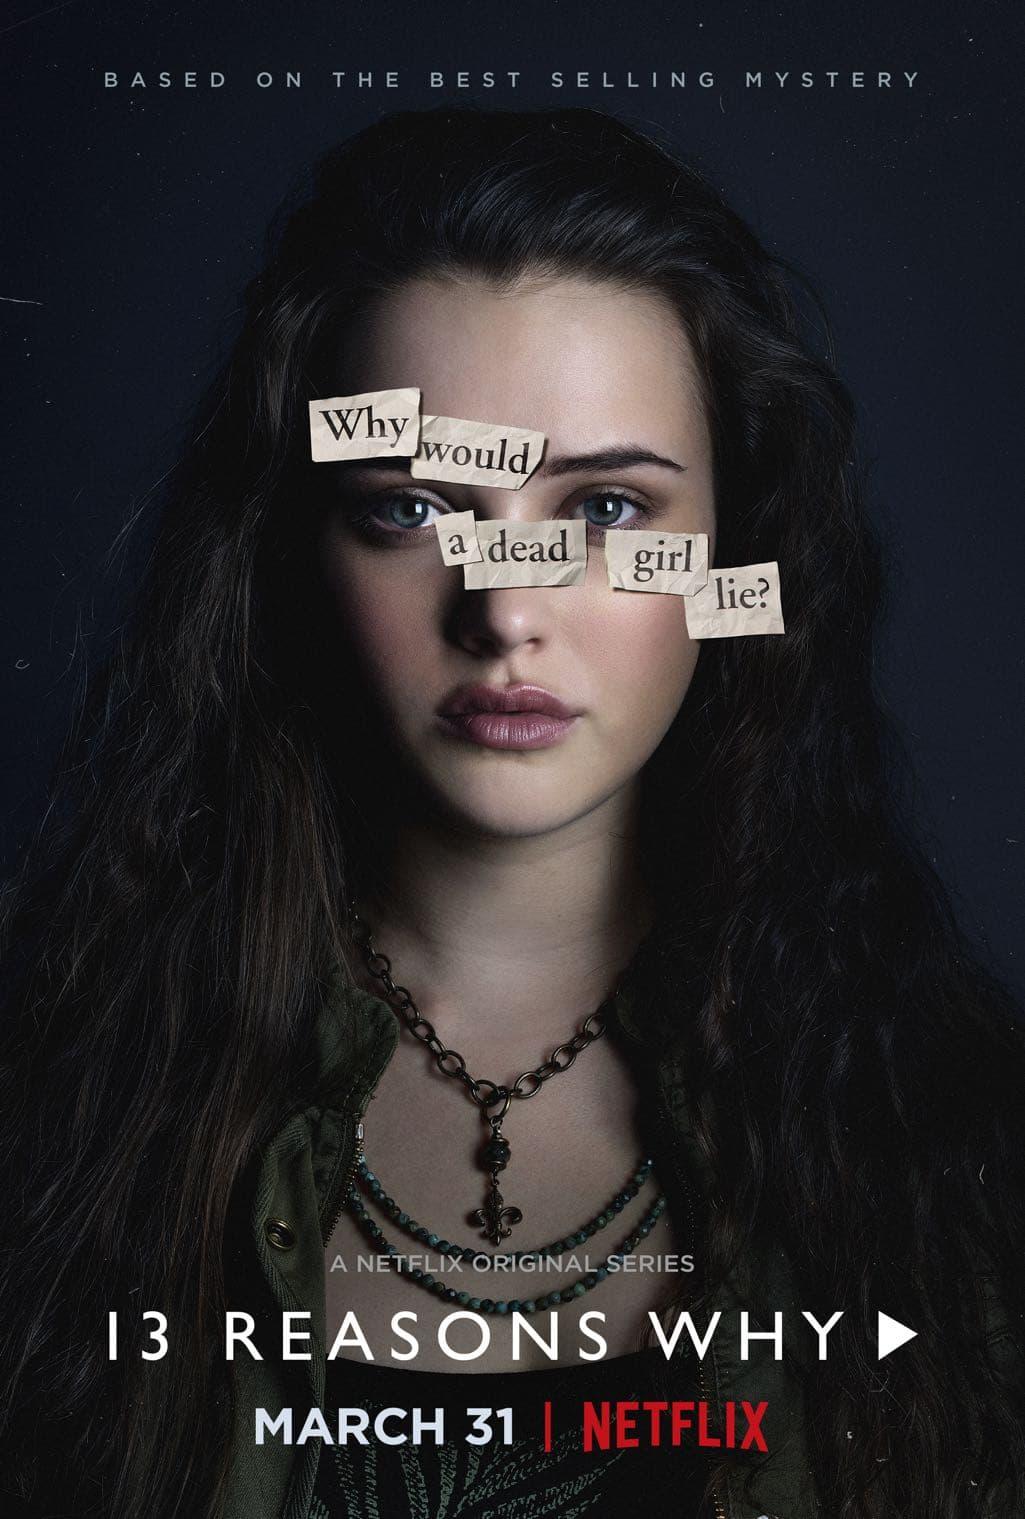 13 Reasons Why Character Poster Katherine Langford as Hannah Baker